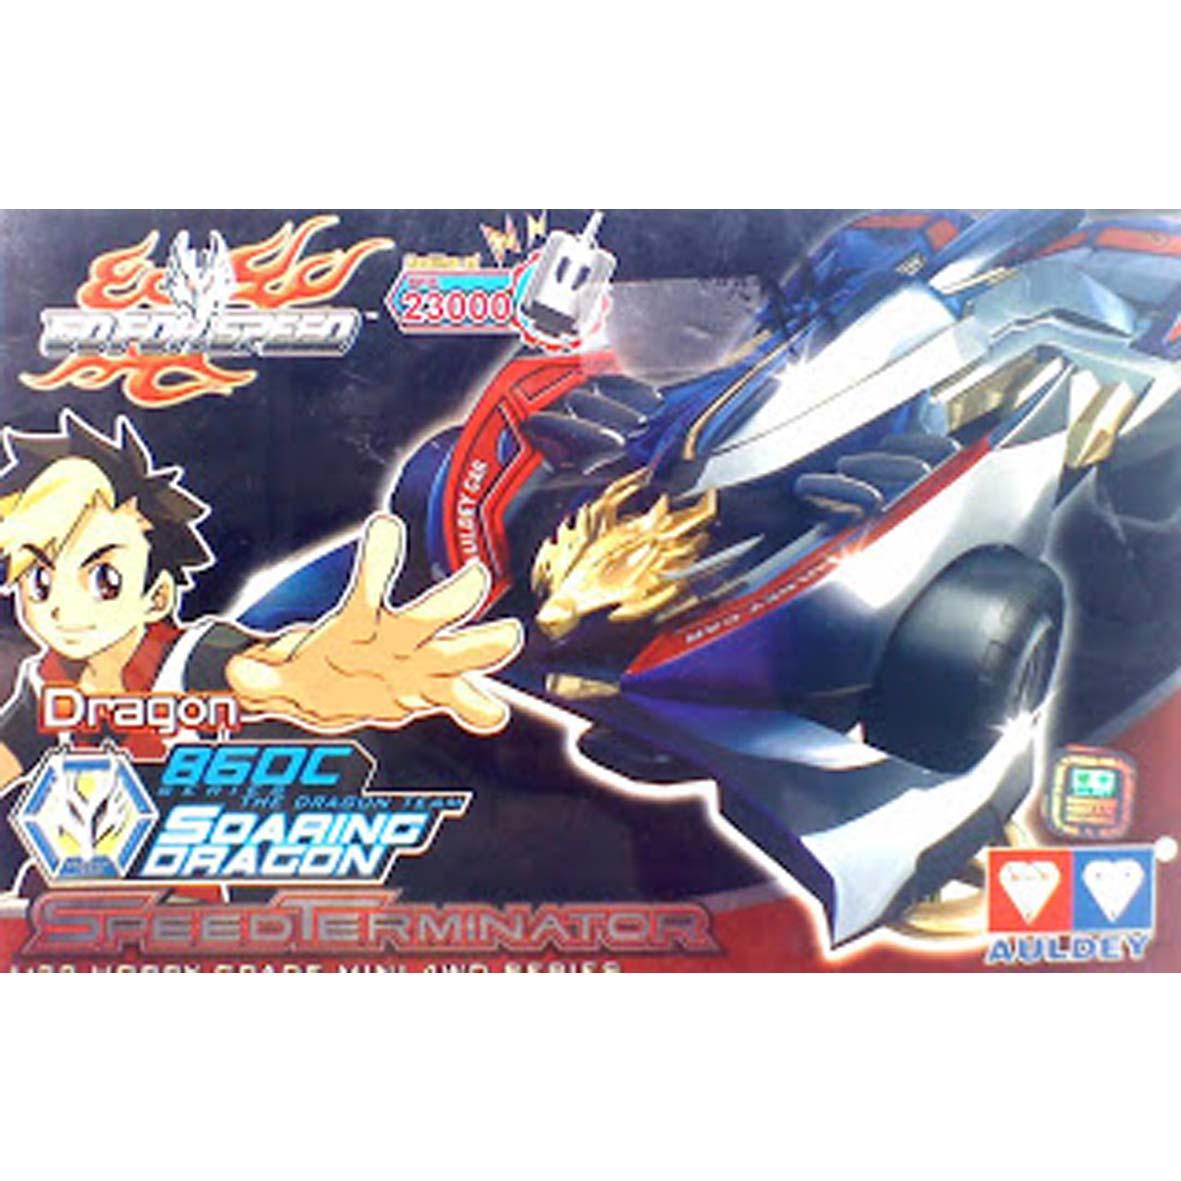 harga tamiya auldey 860c series soaring dragon go for speed mini 4wd 1:32 Tokopedia.com